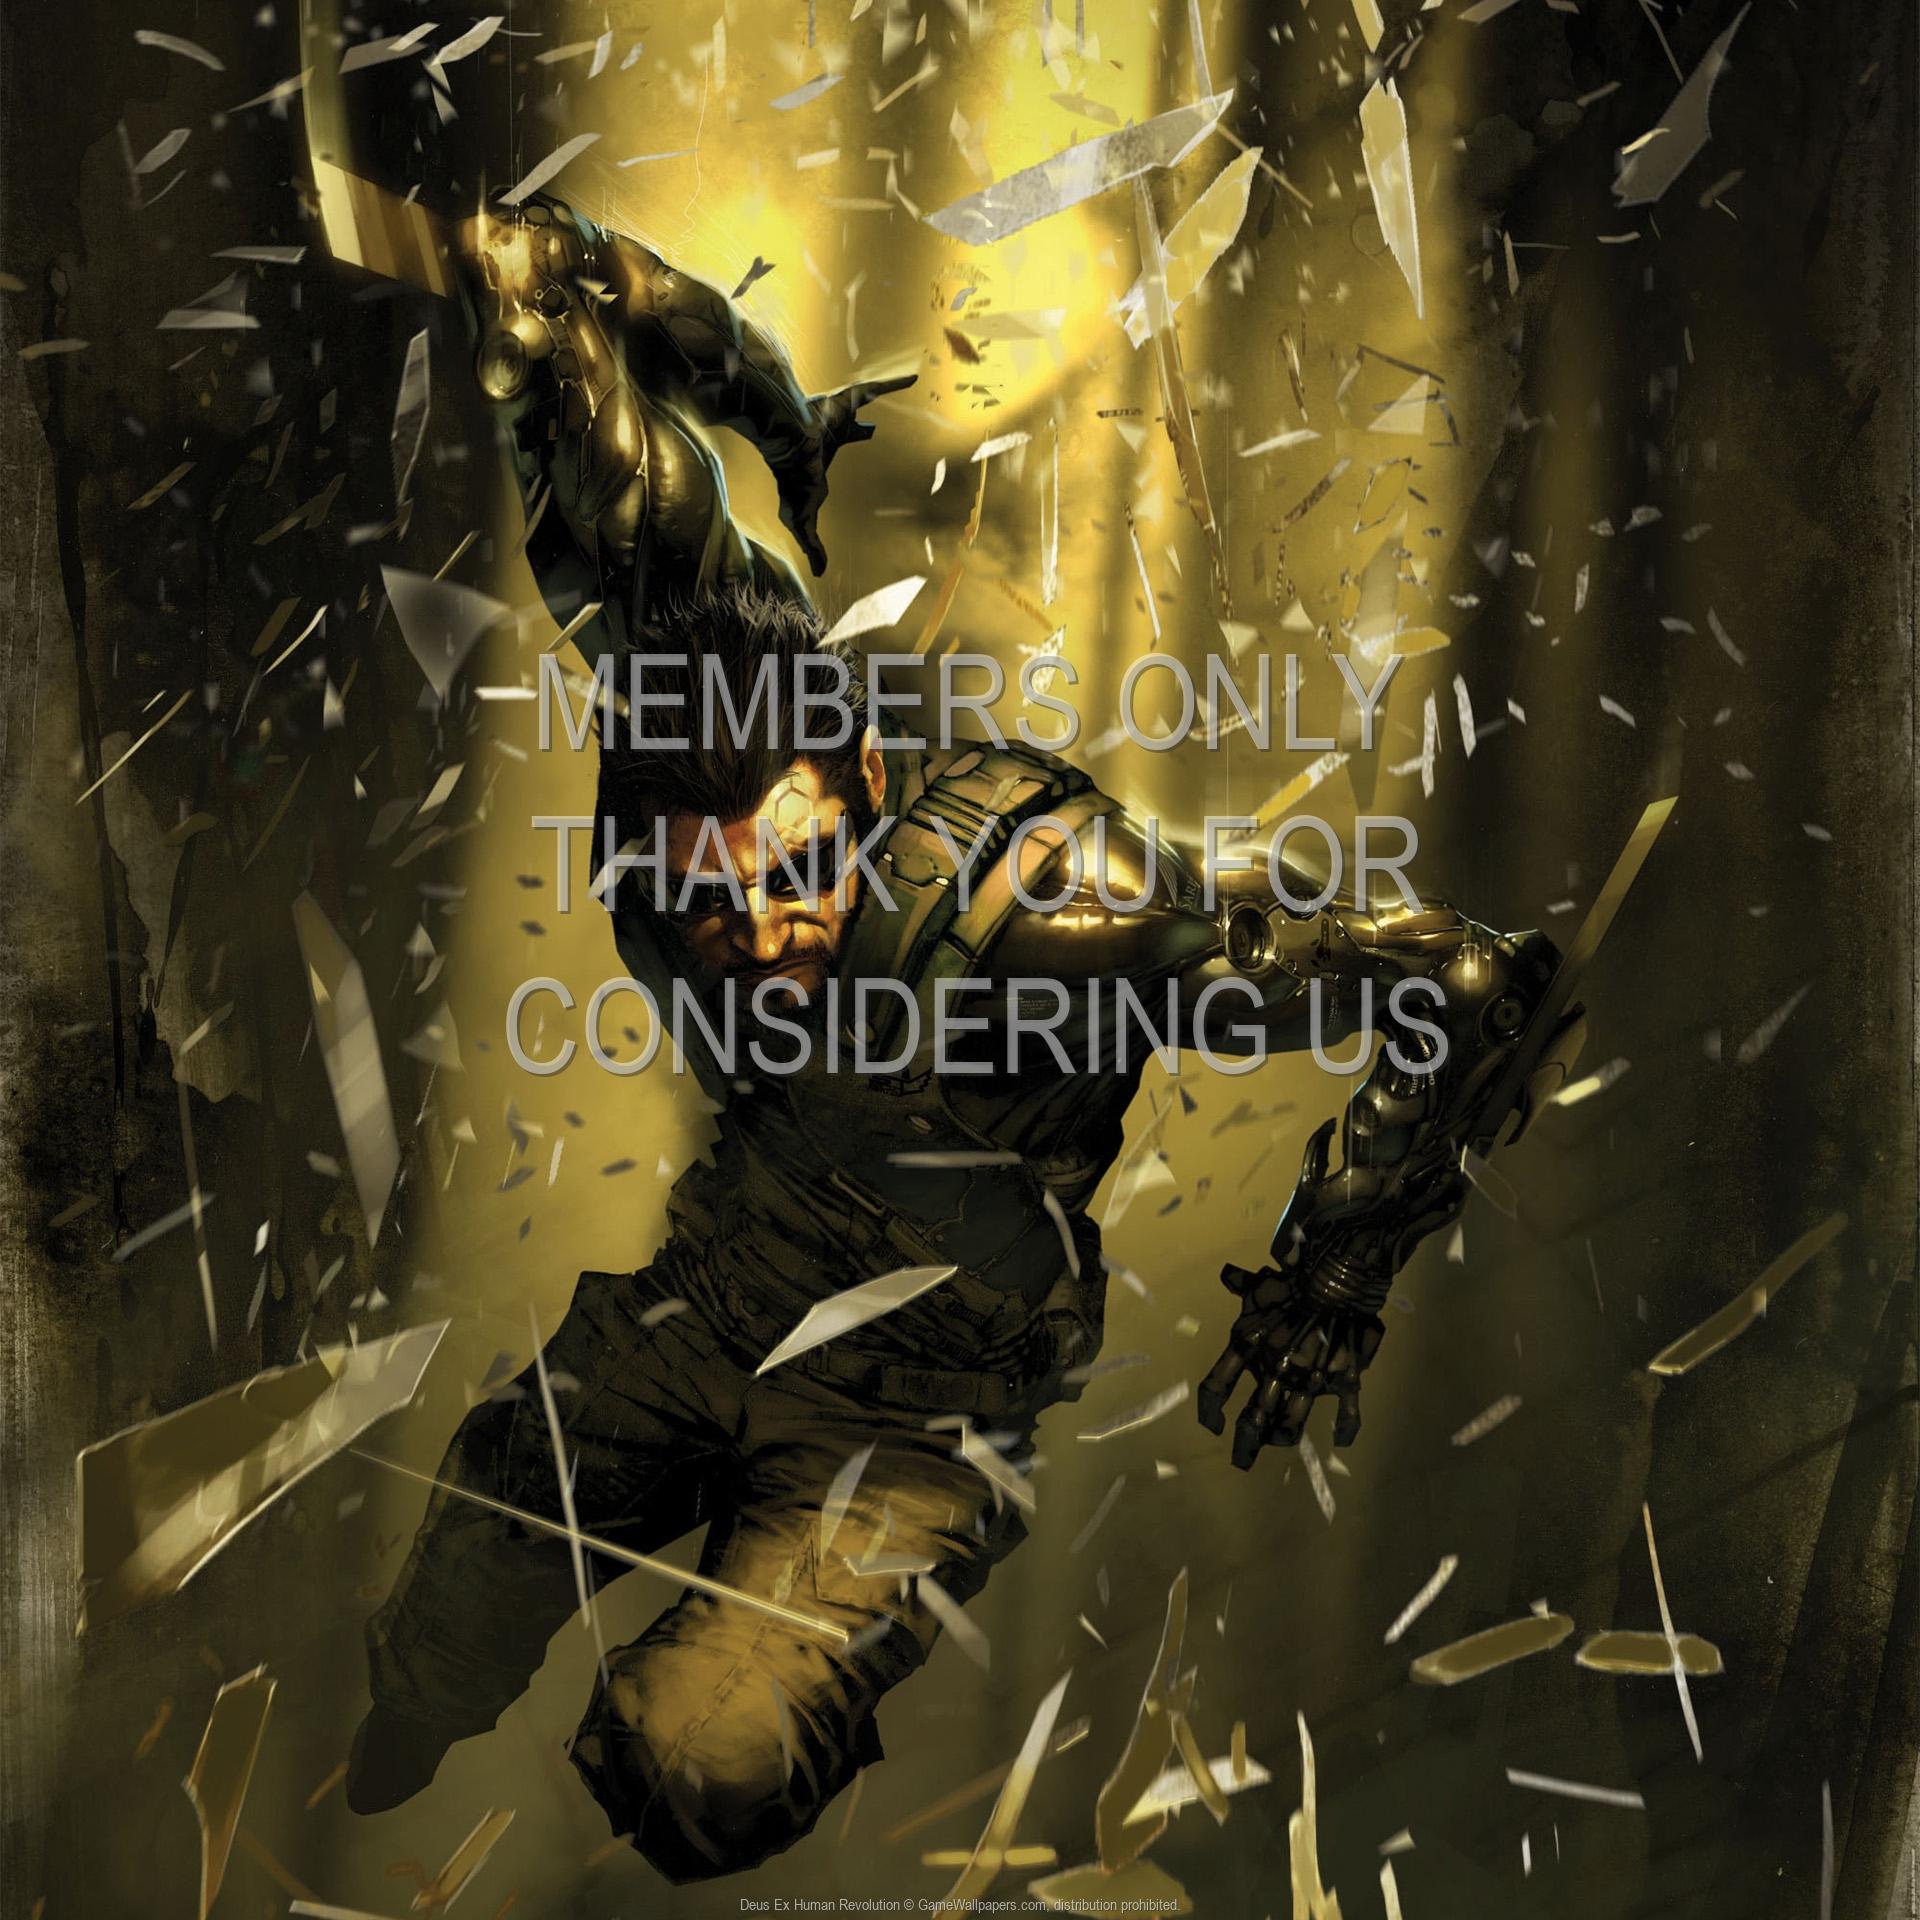 Deus Ex: Human Revolution 1920x1080 Handy Hintergrundbild 15